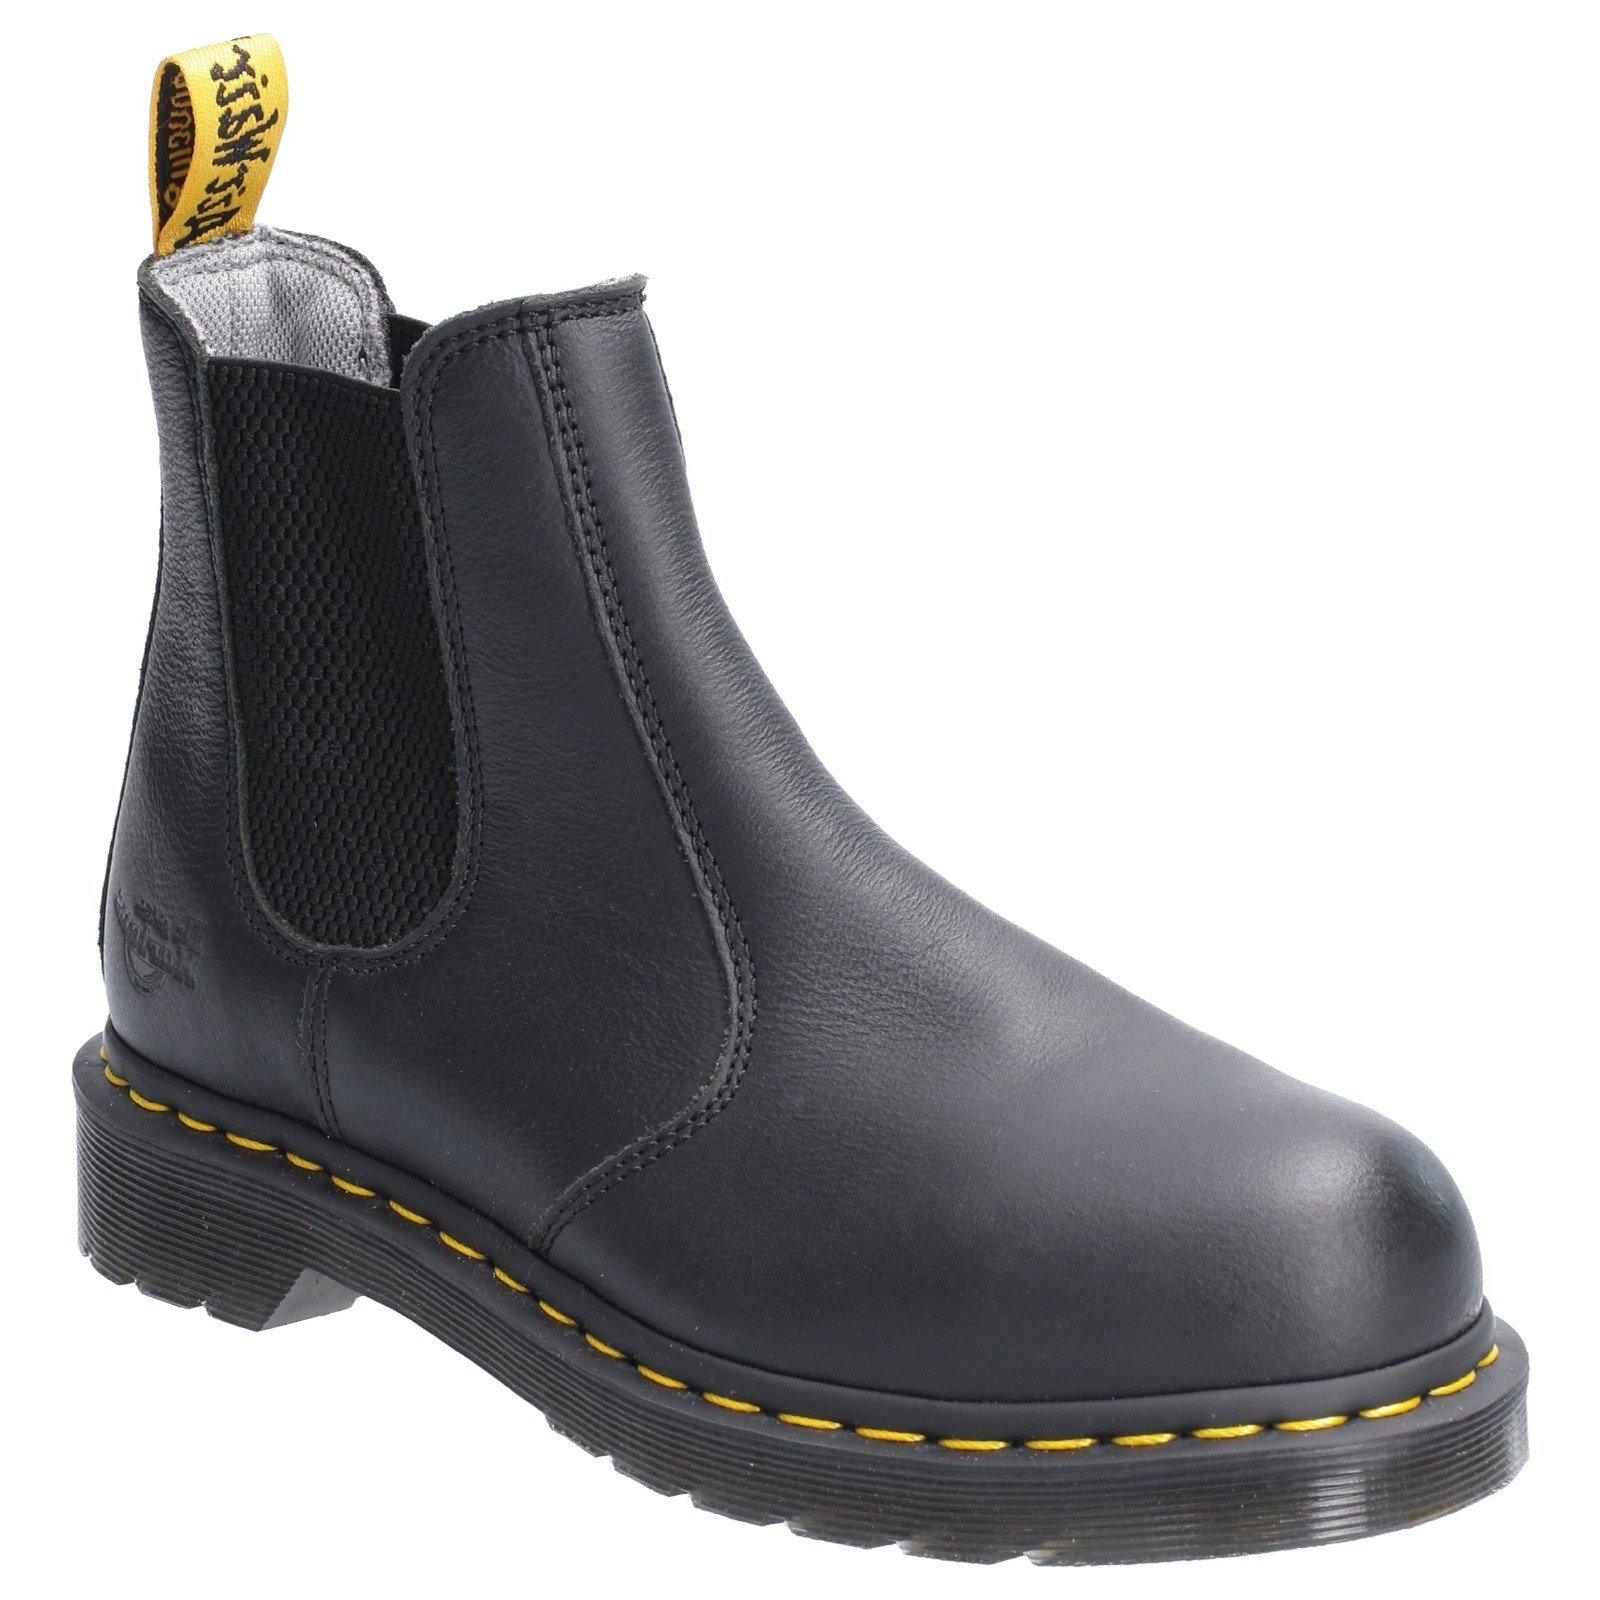 Dr Martens Women's Arbor Elastic Safety Boot Various Colours 29517 - Black 3